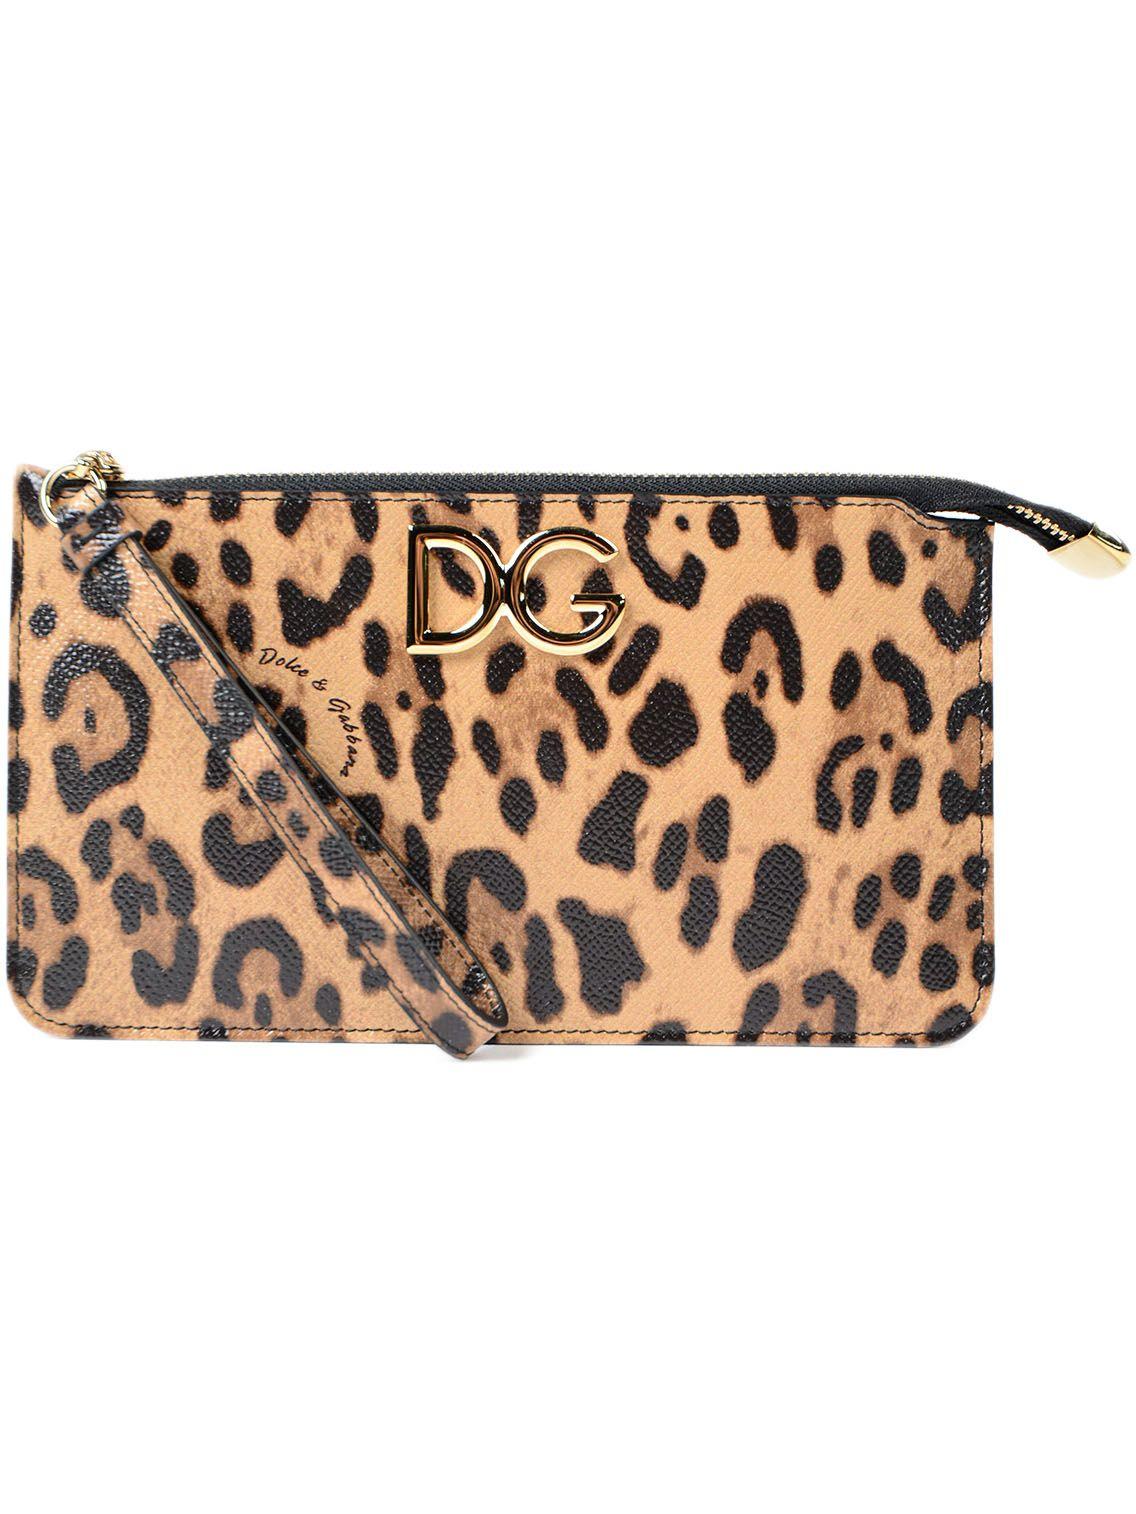 Dolce & Gabbana Dolce & Gabbana Leopard Print Clutch